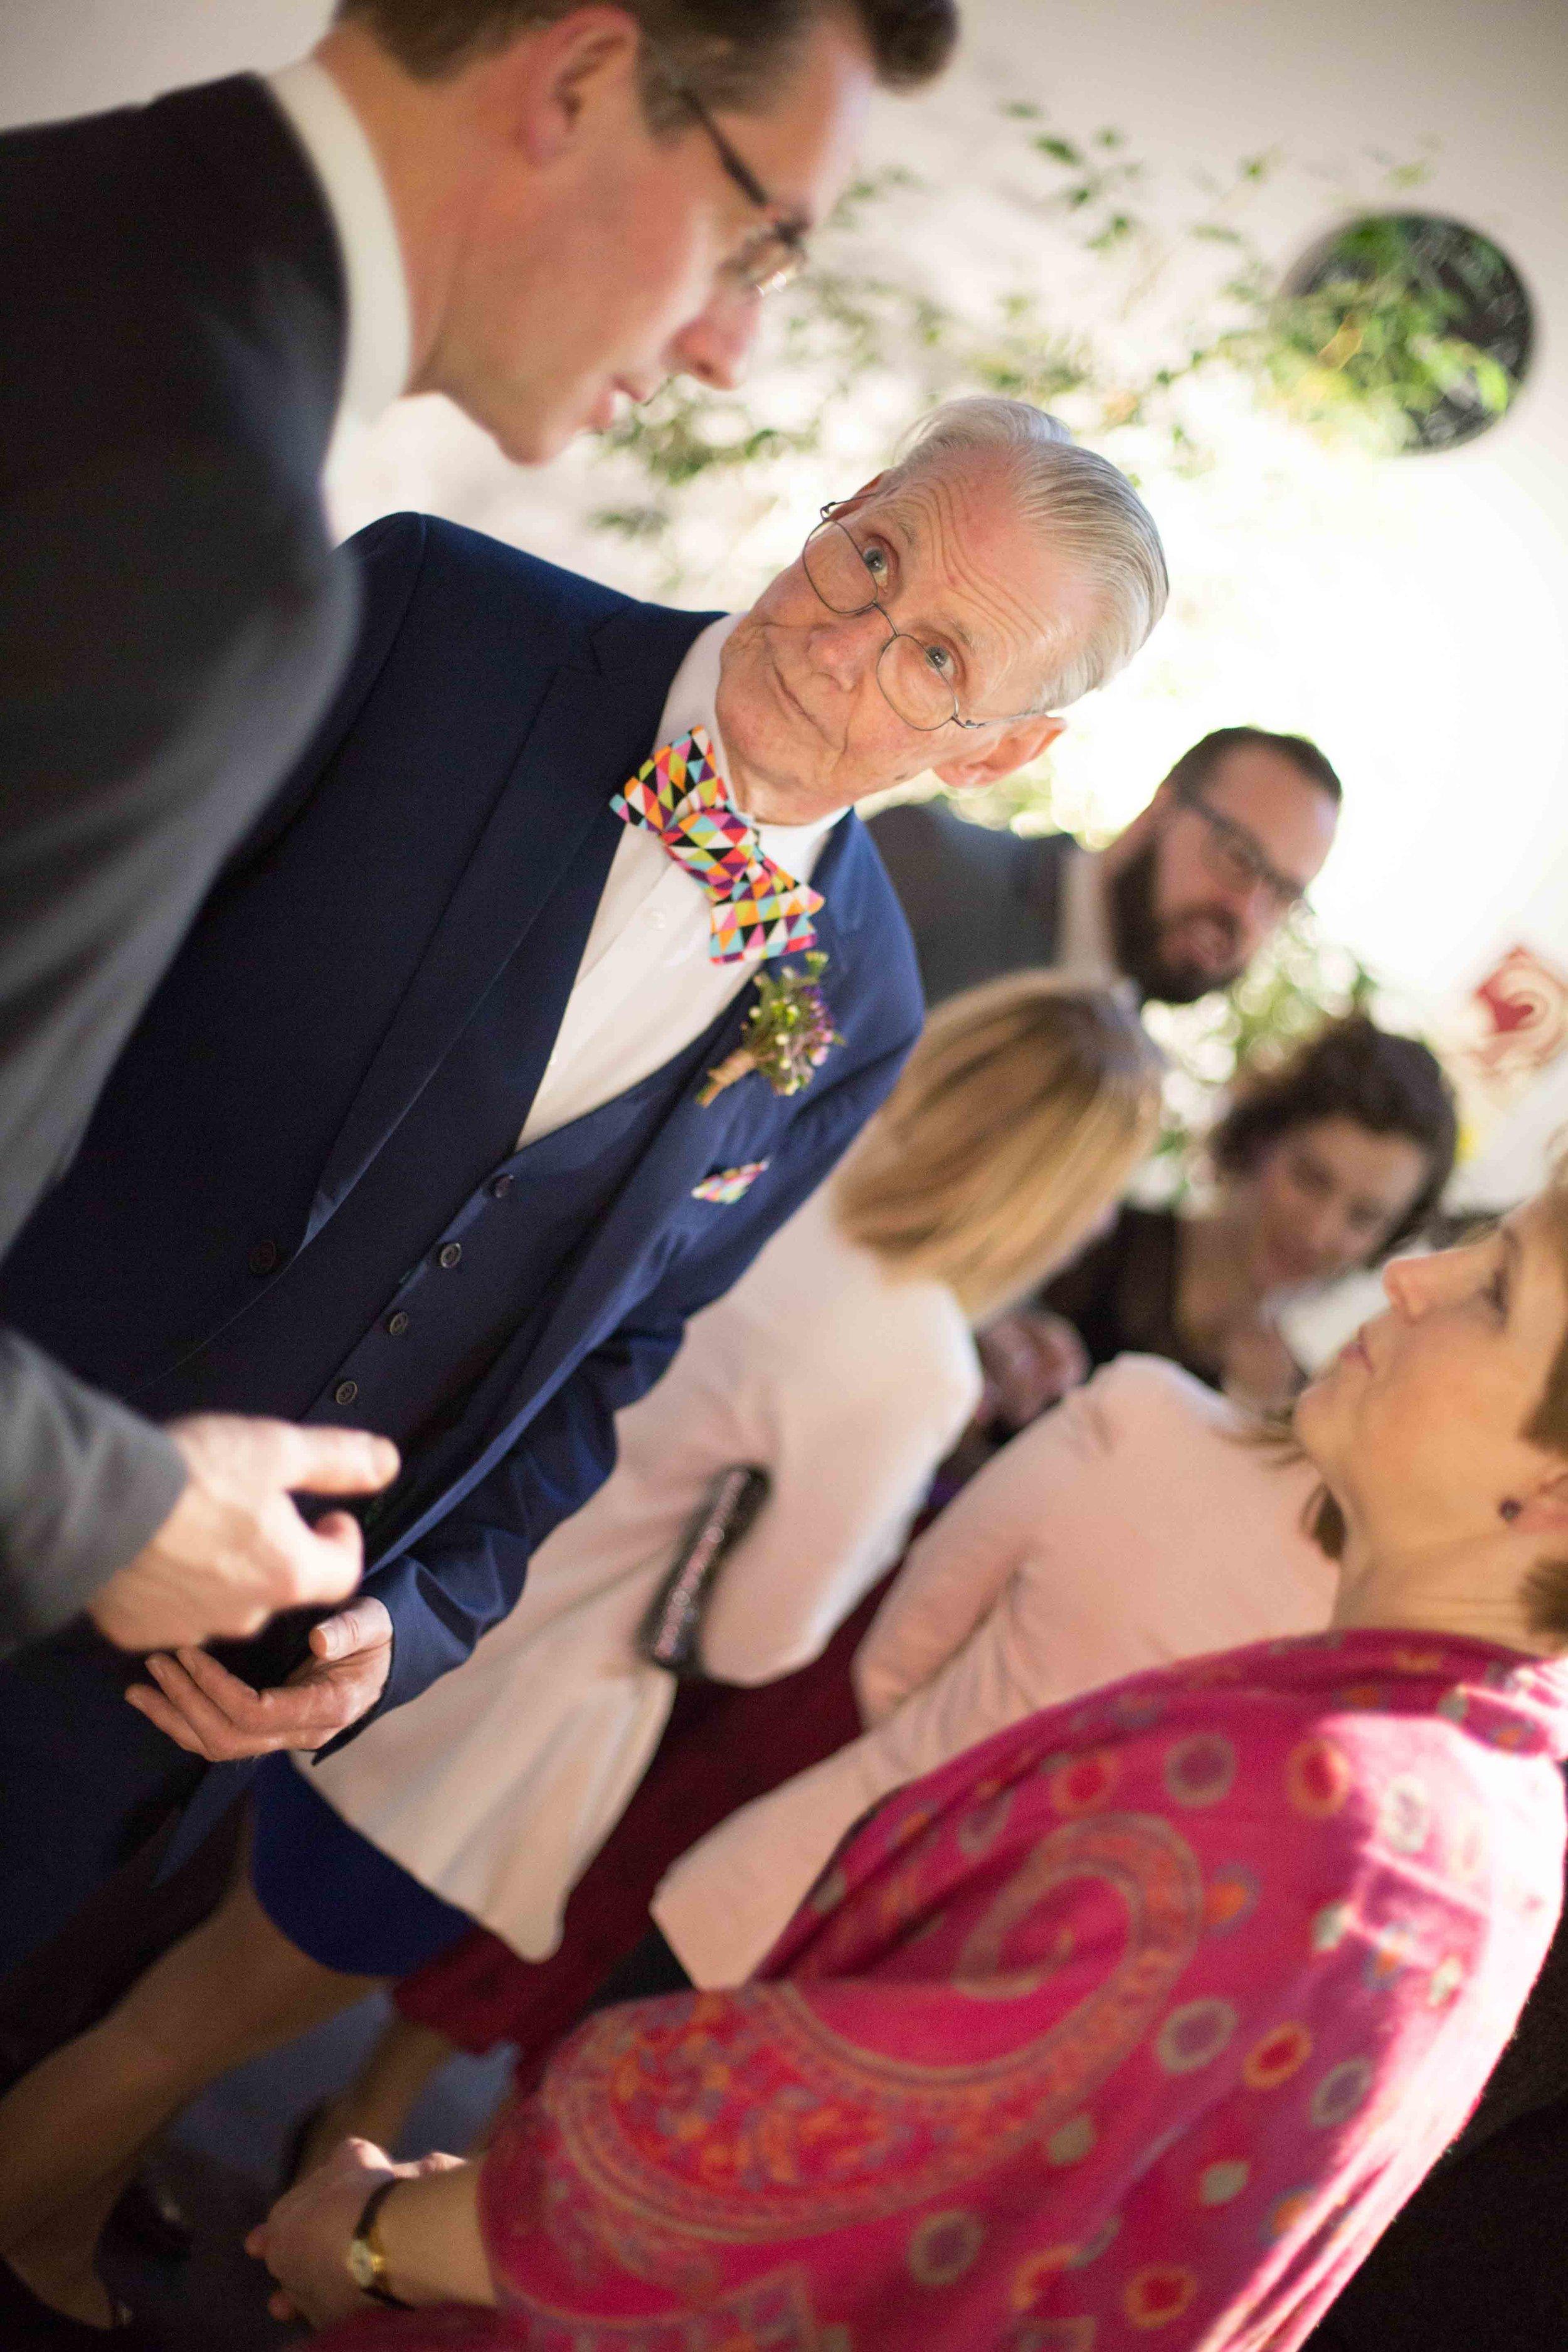 Adam & Faye - Wright Wedding Photography - Bristol Wedding Photographer -234.jpg